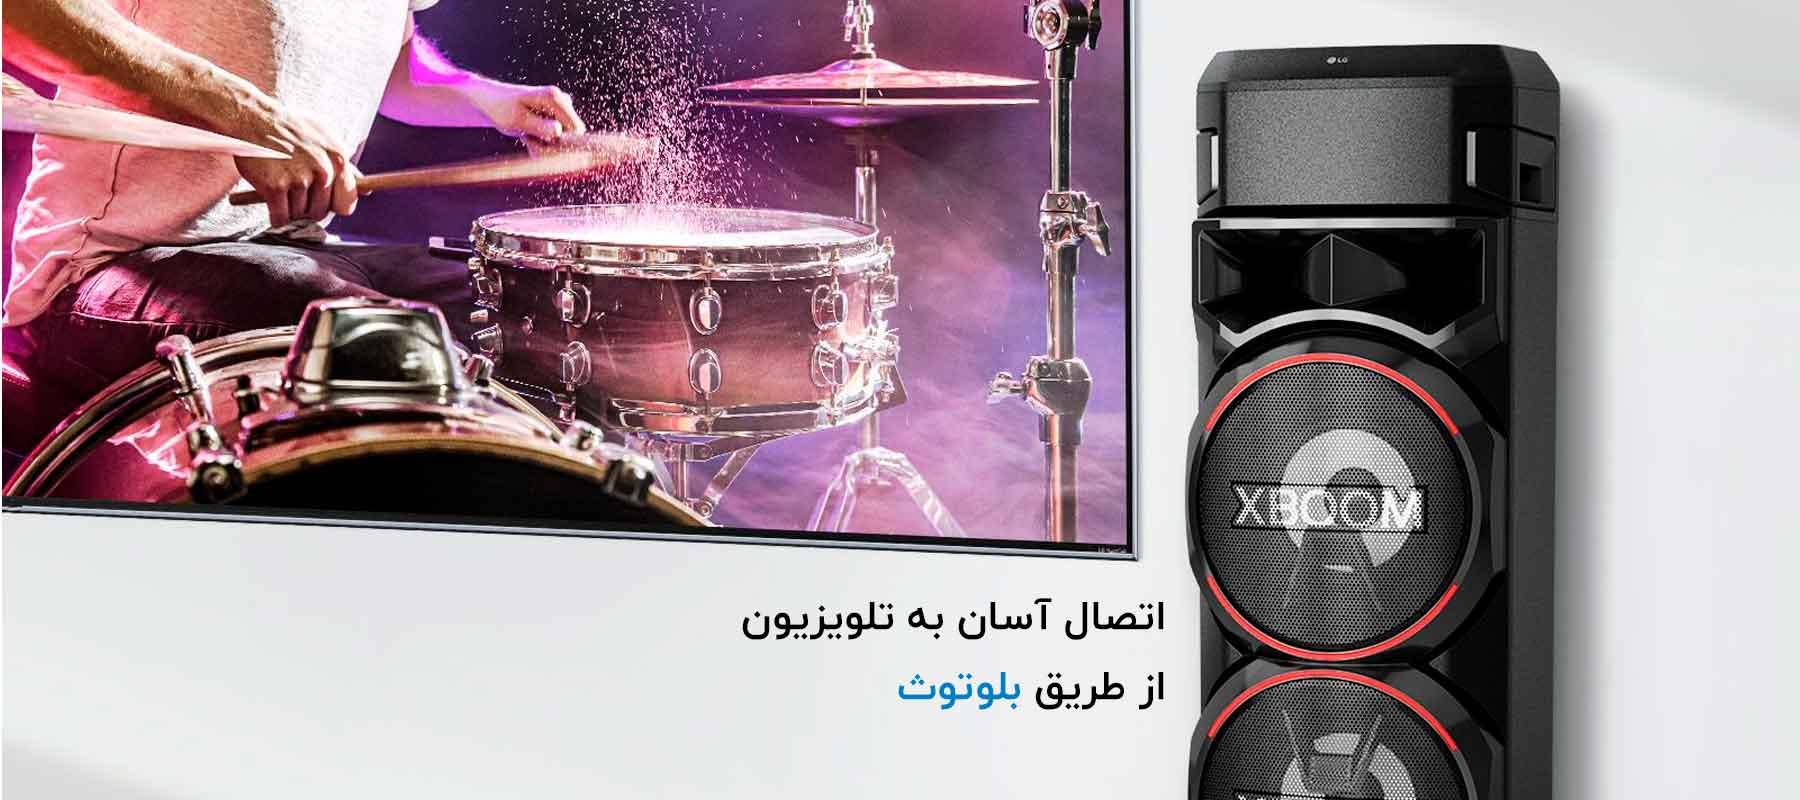 قابلیت اتصال سیستم صوتی ON9 به تلویزیون